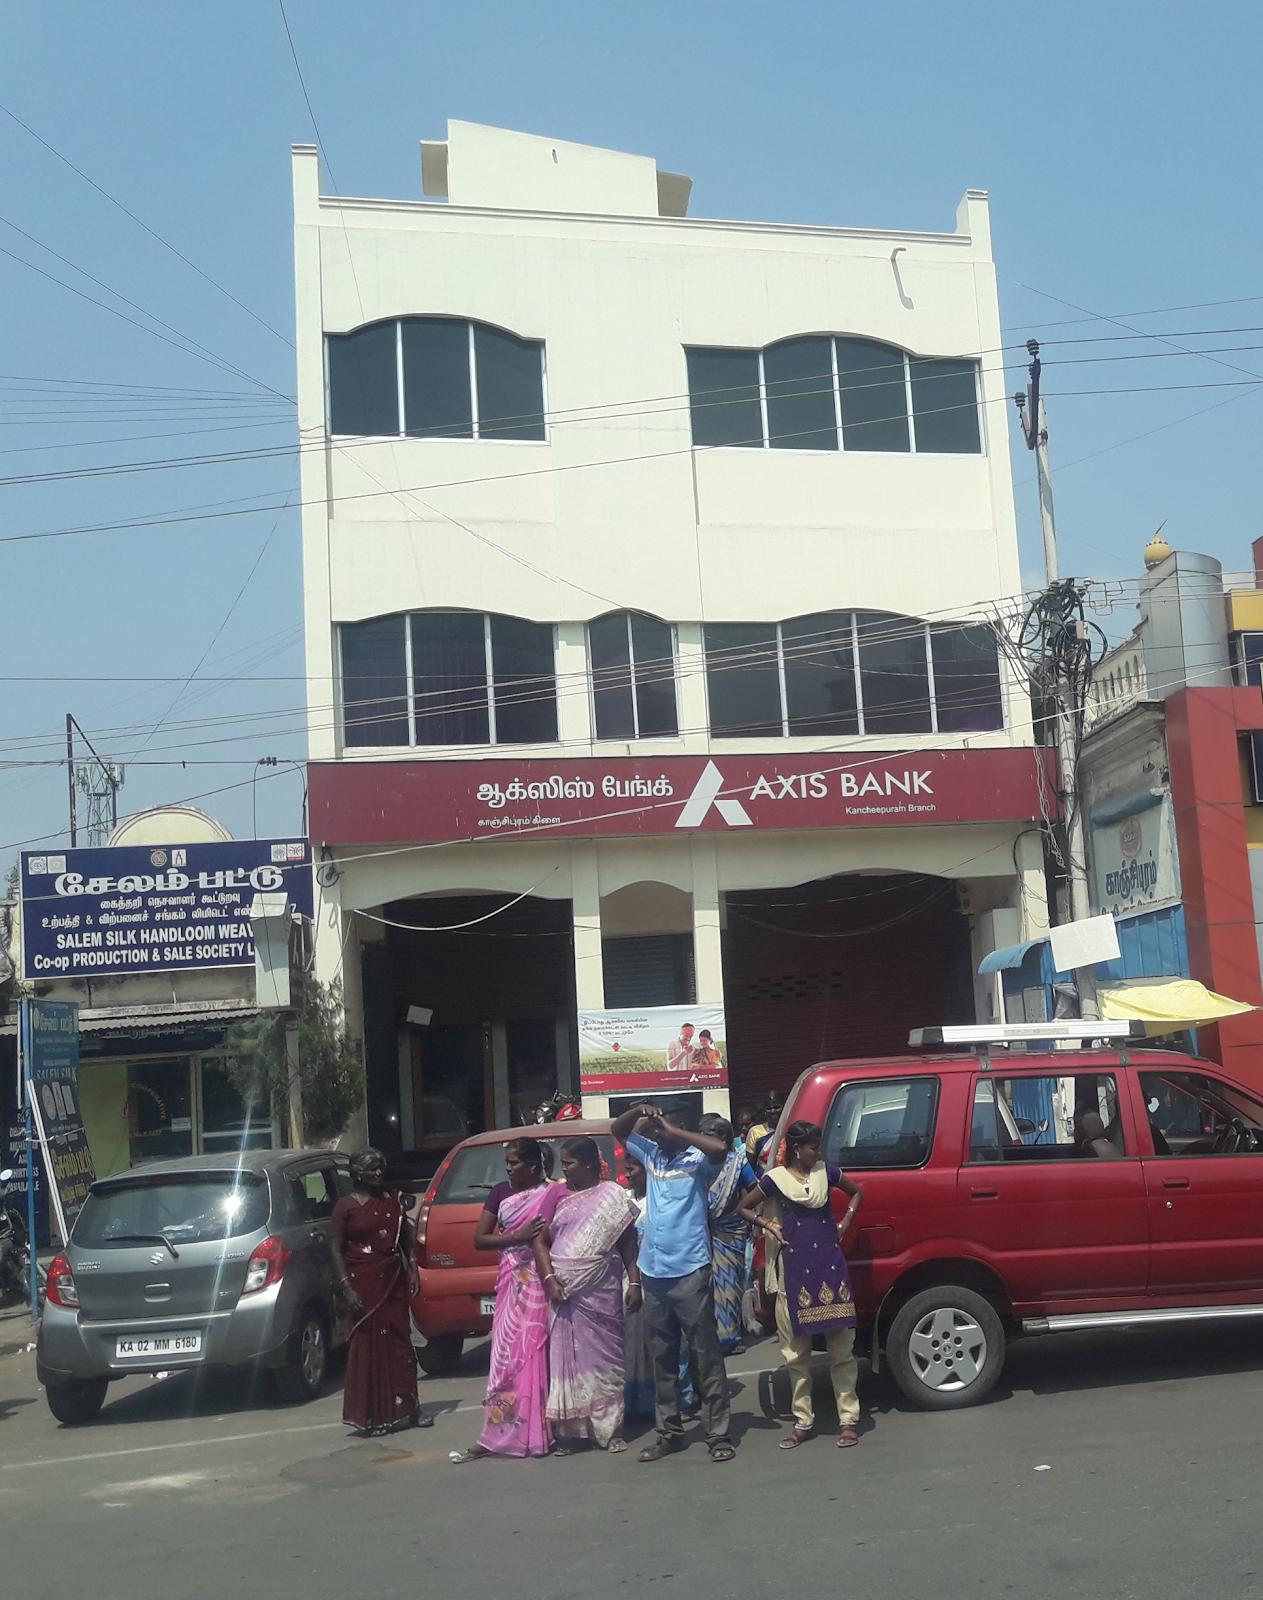 blood bank Axis Bank near Kanchipuram Tamil Nadu